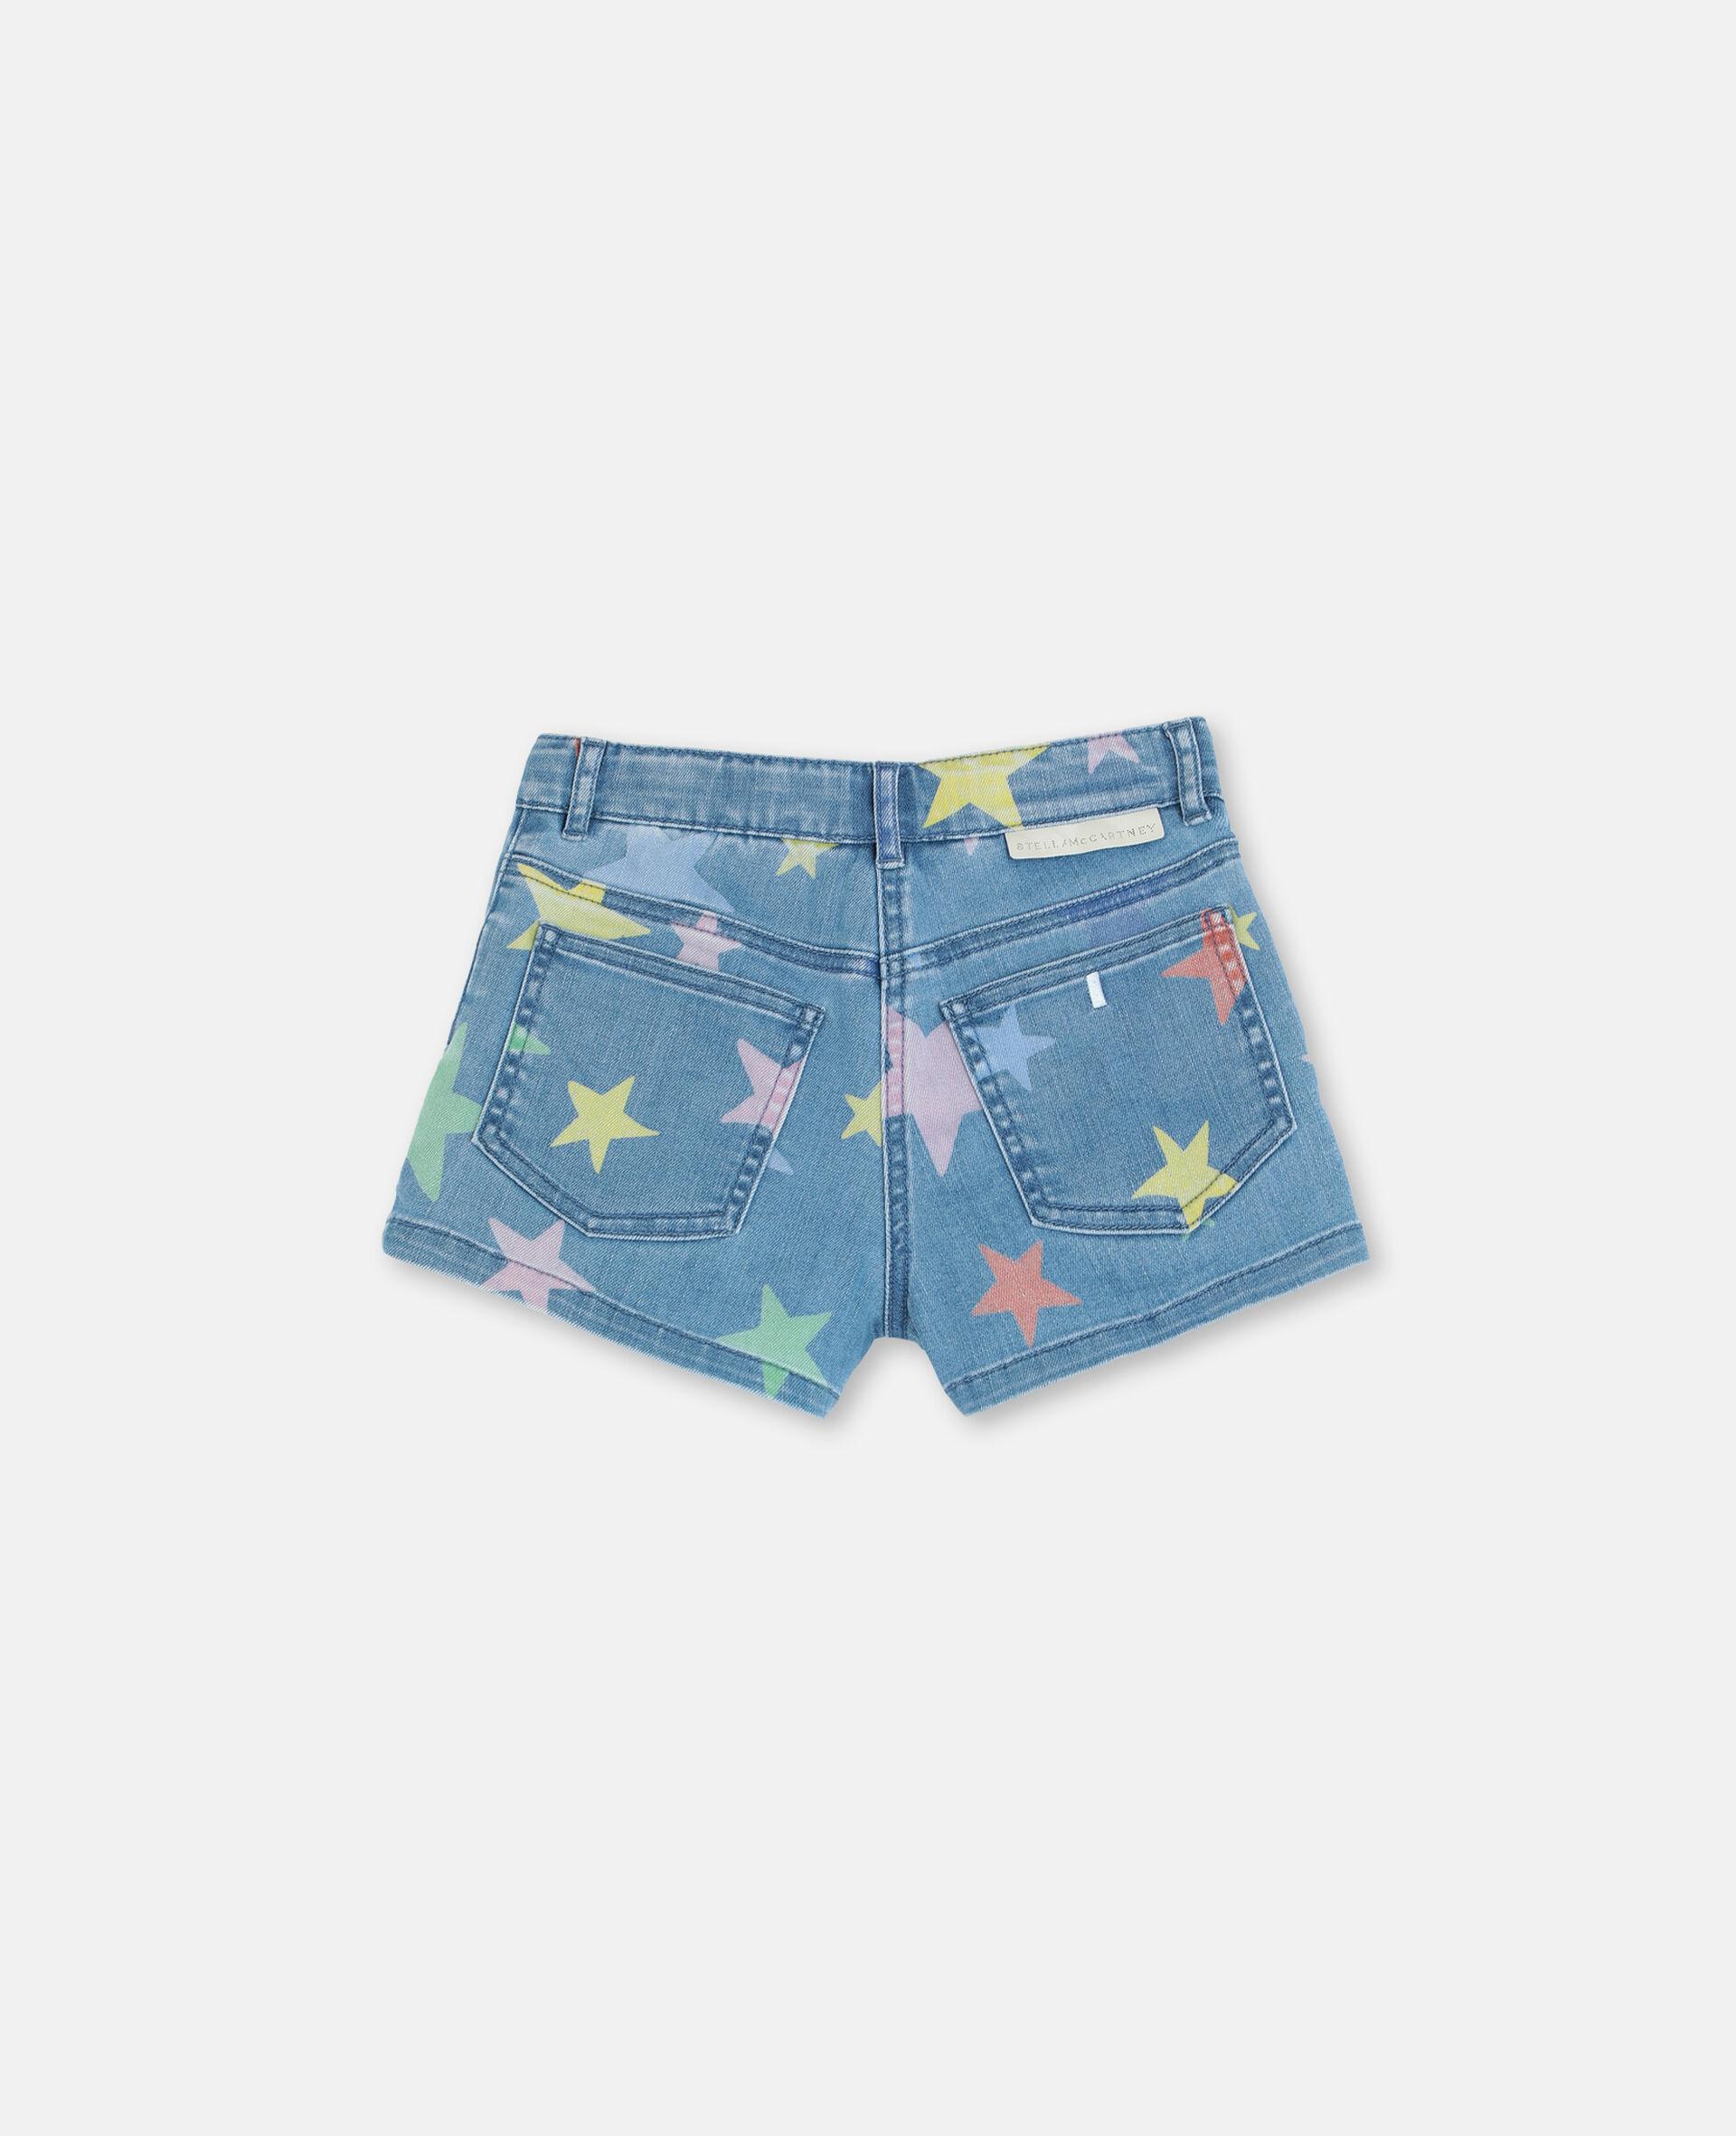 Multicolour Stars Denim Shorts -Multicolour-large image number 3